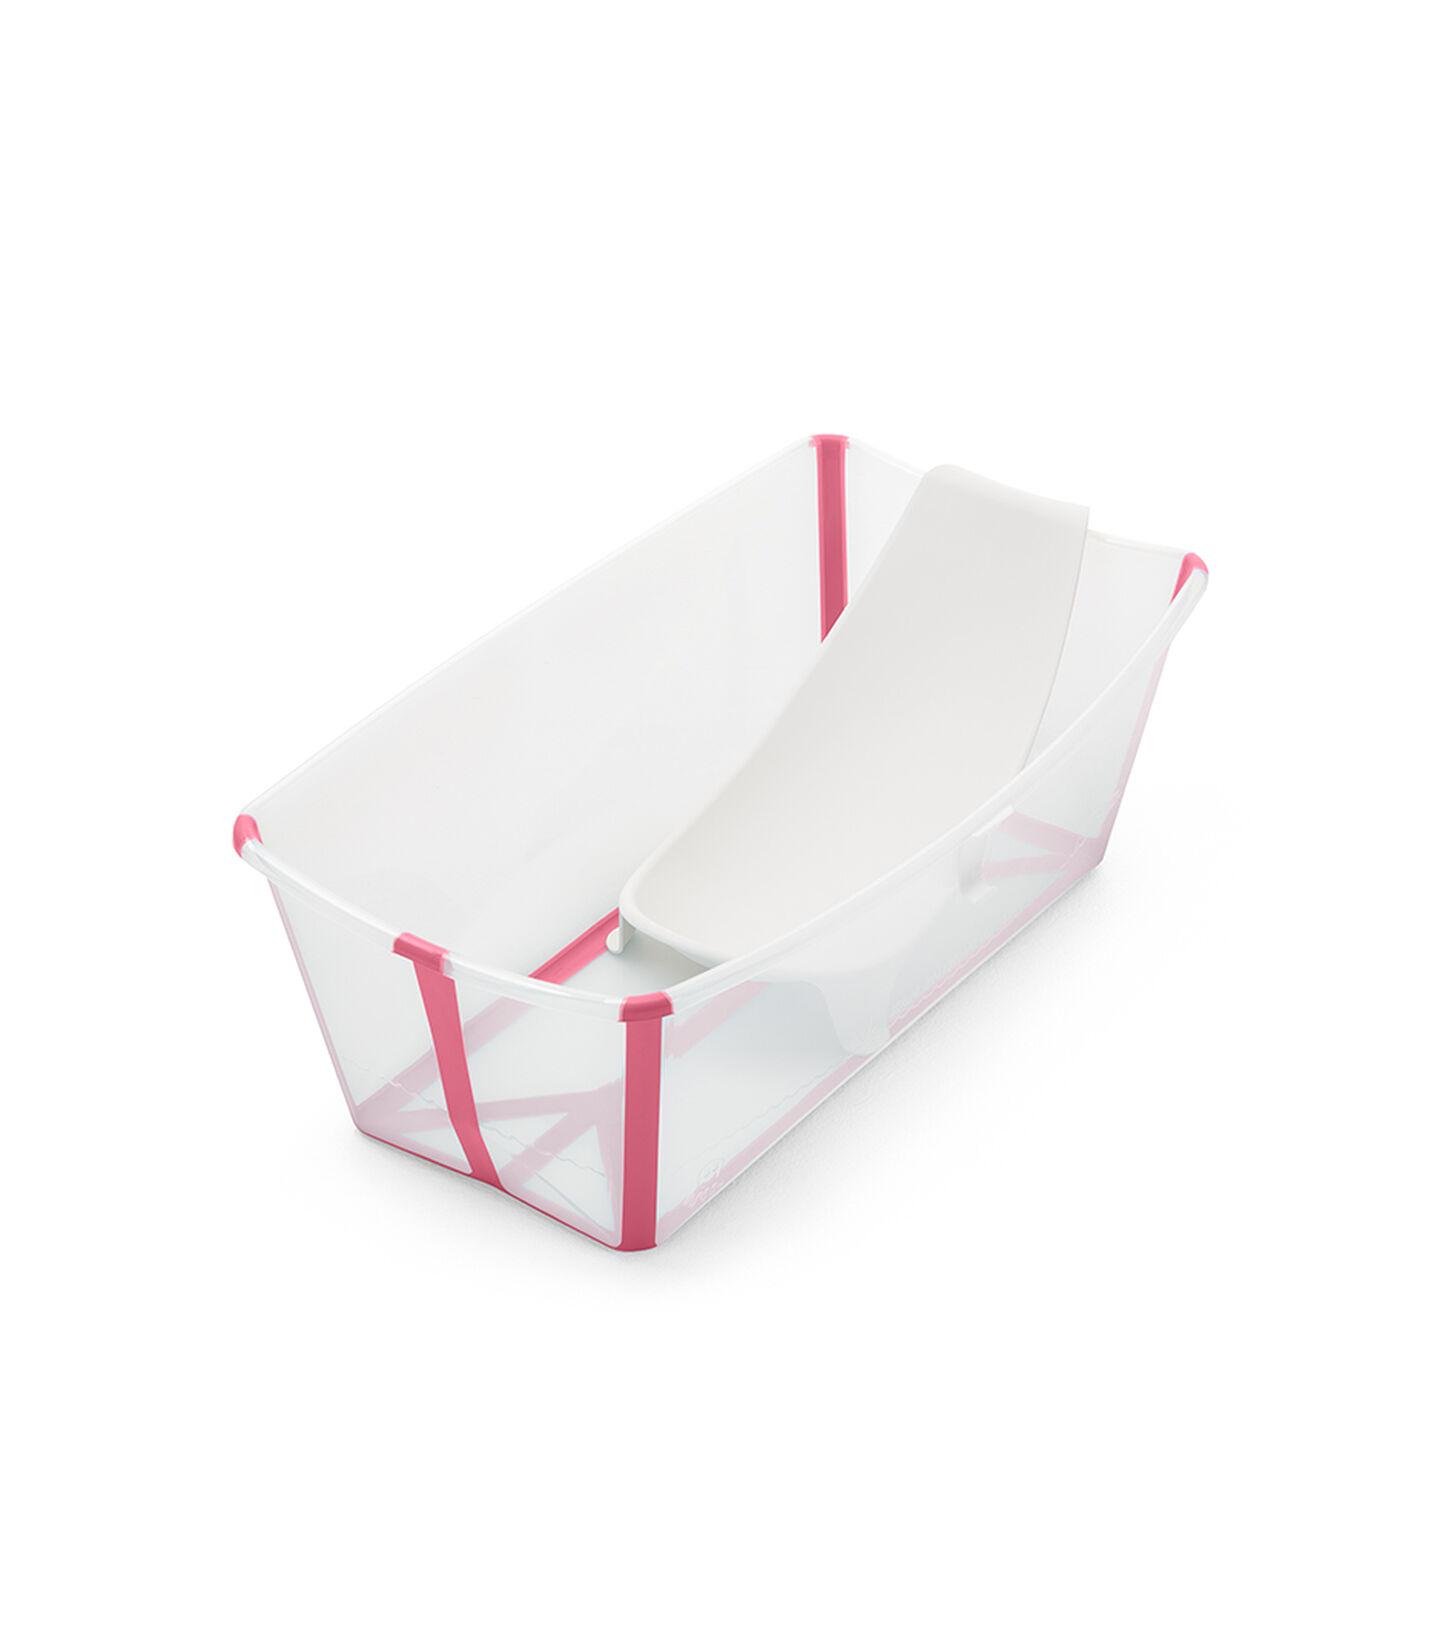 Stokke® Flexi Bath® bath tub, Transparent Pink with Newborn insert. view 1